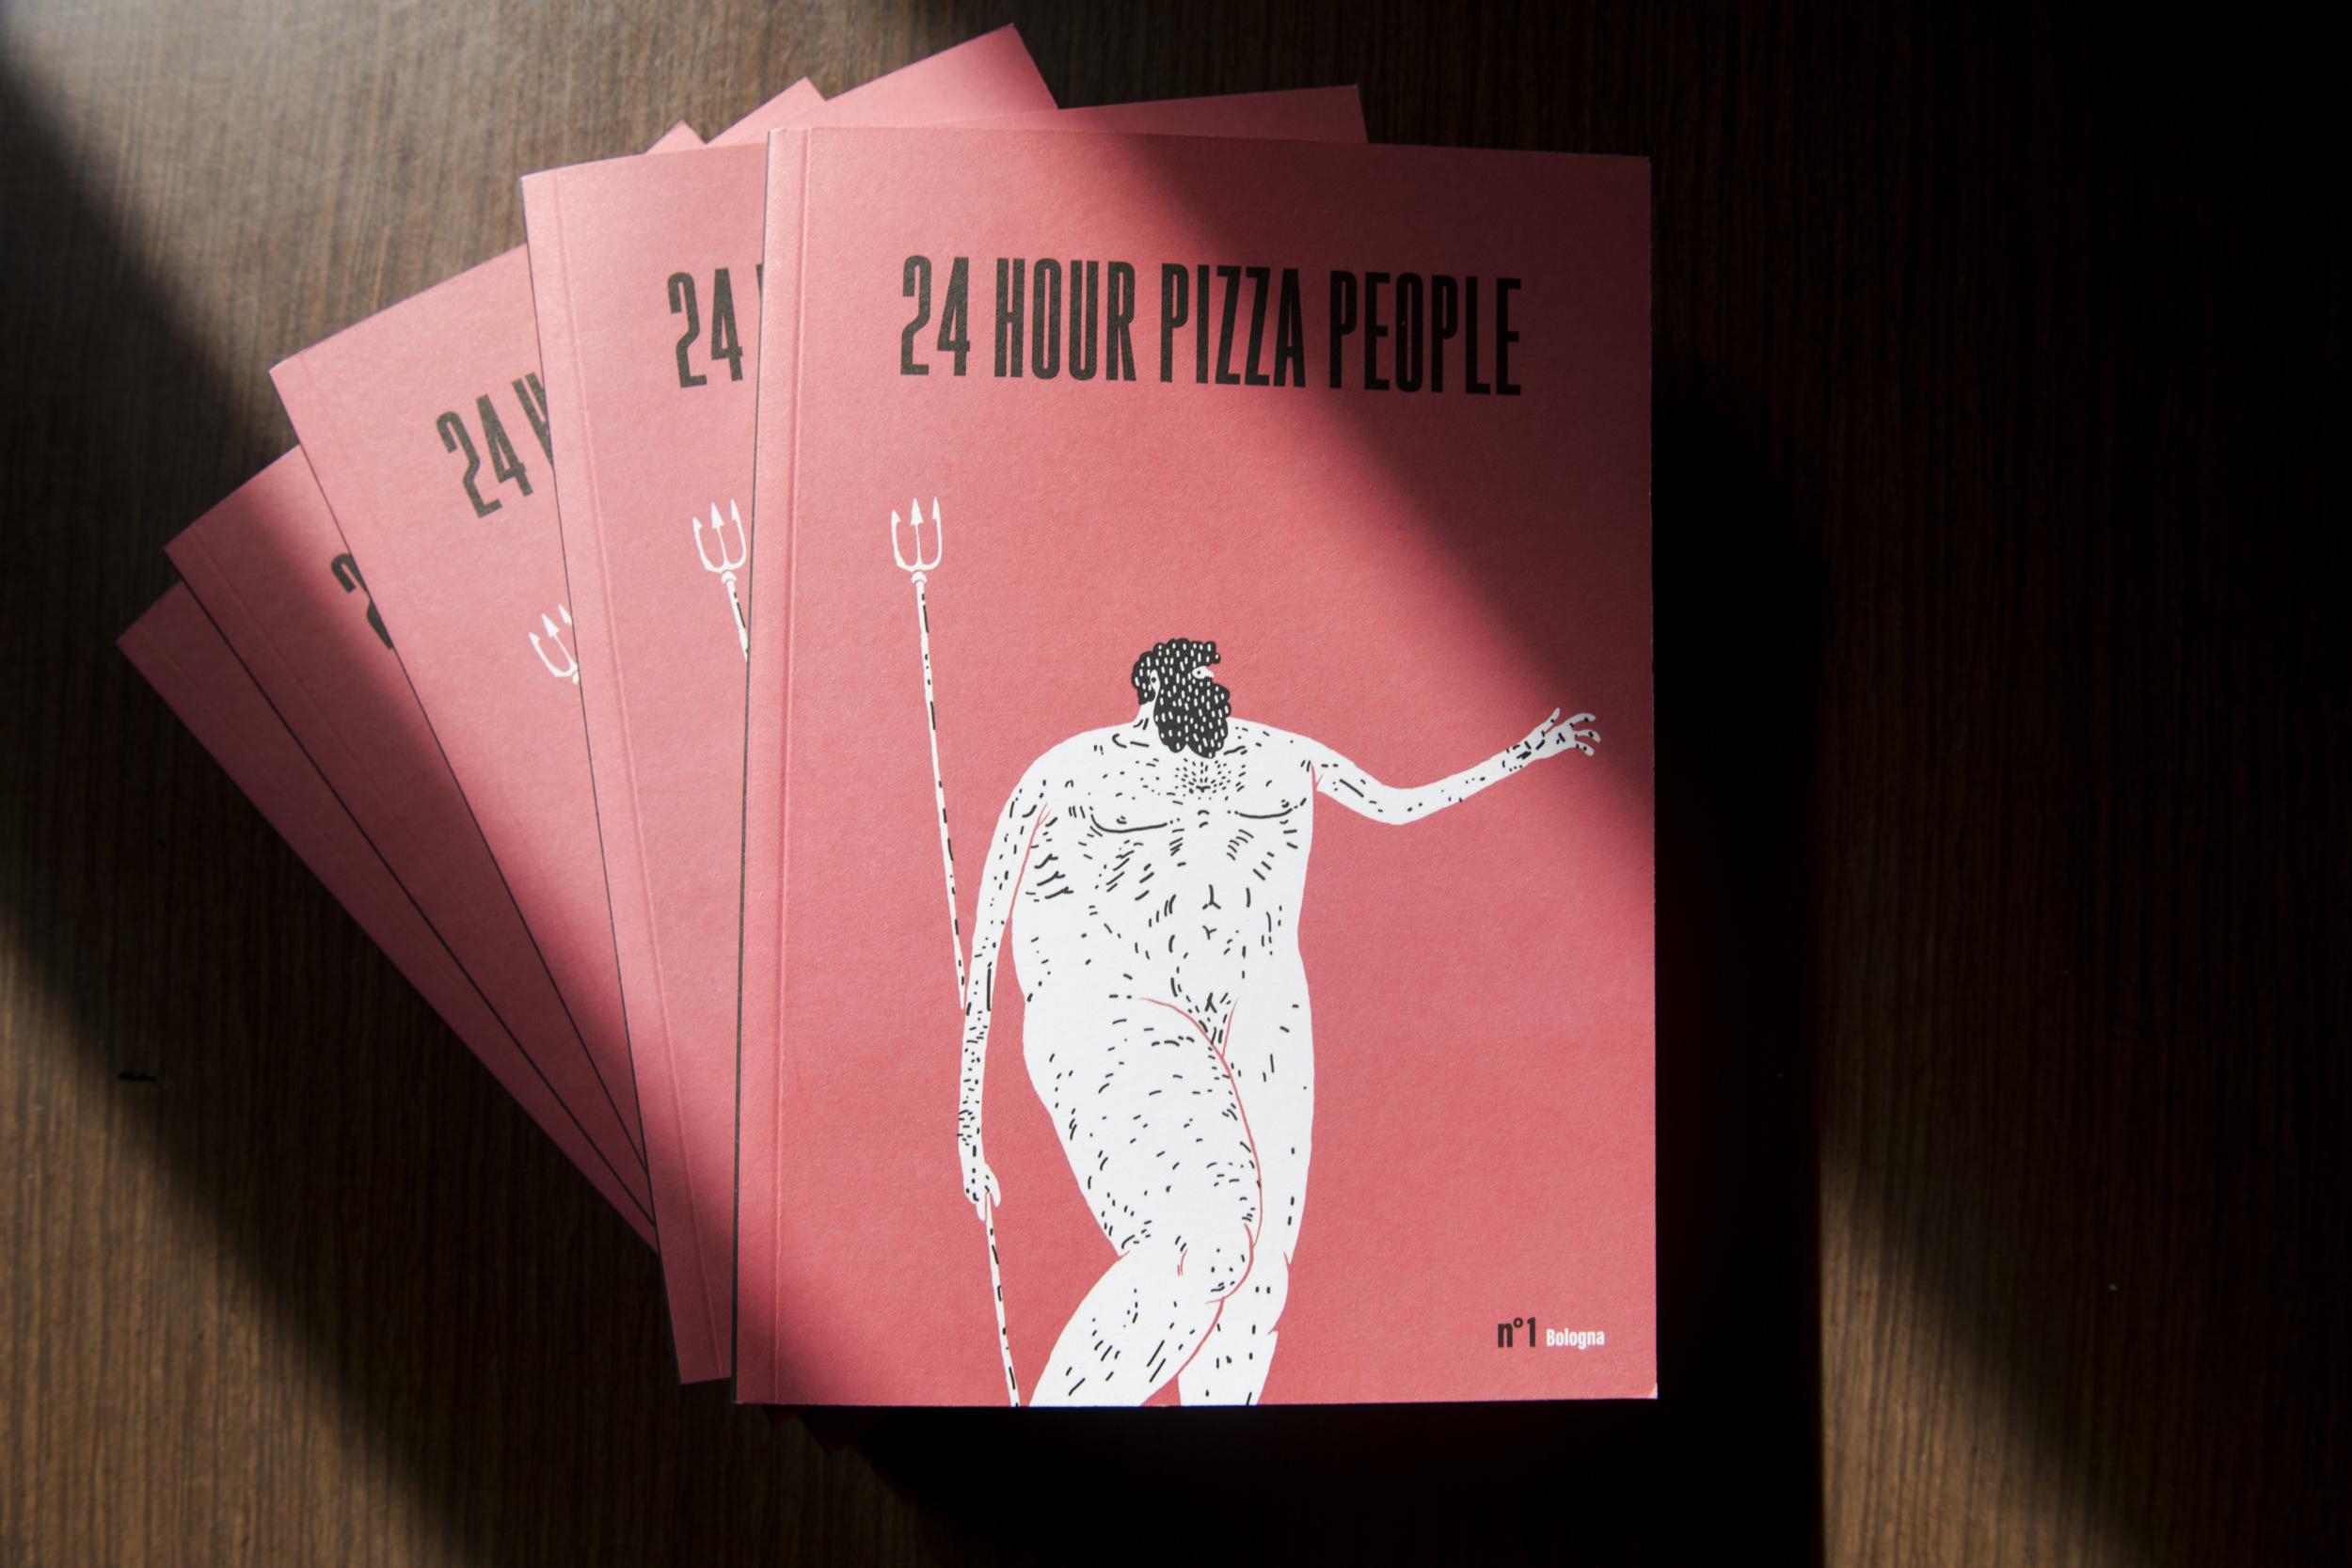 24 HOUR PIZZA PEOPLE - MAGAZINE 00001